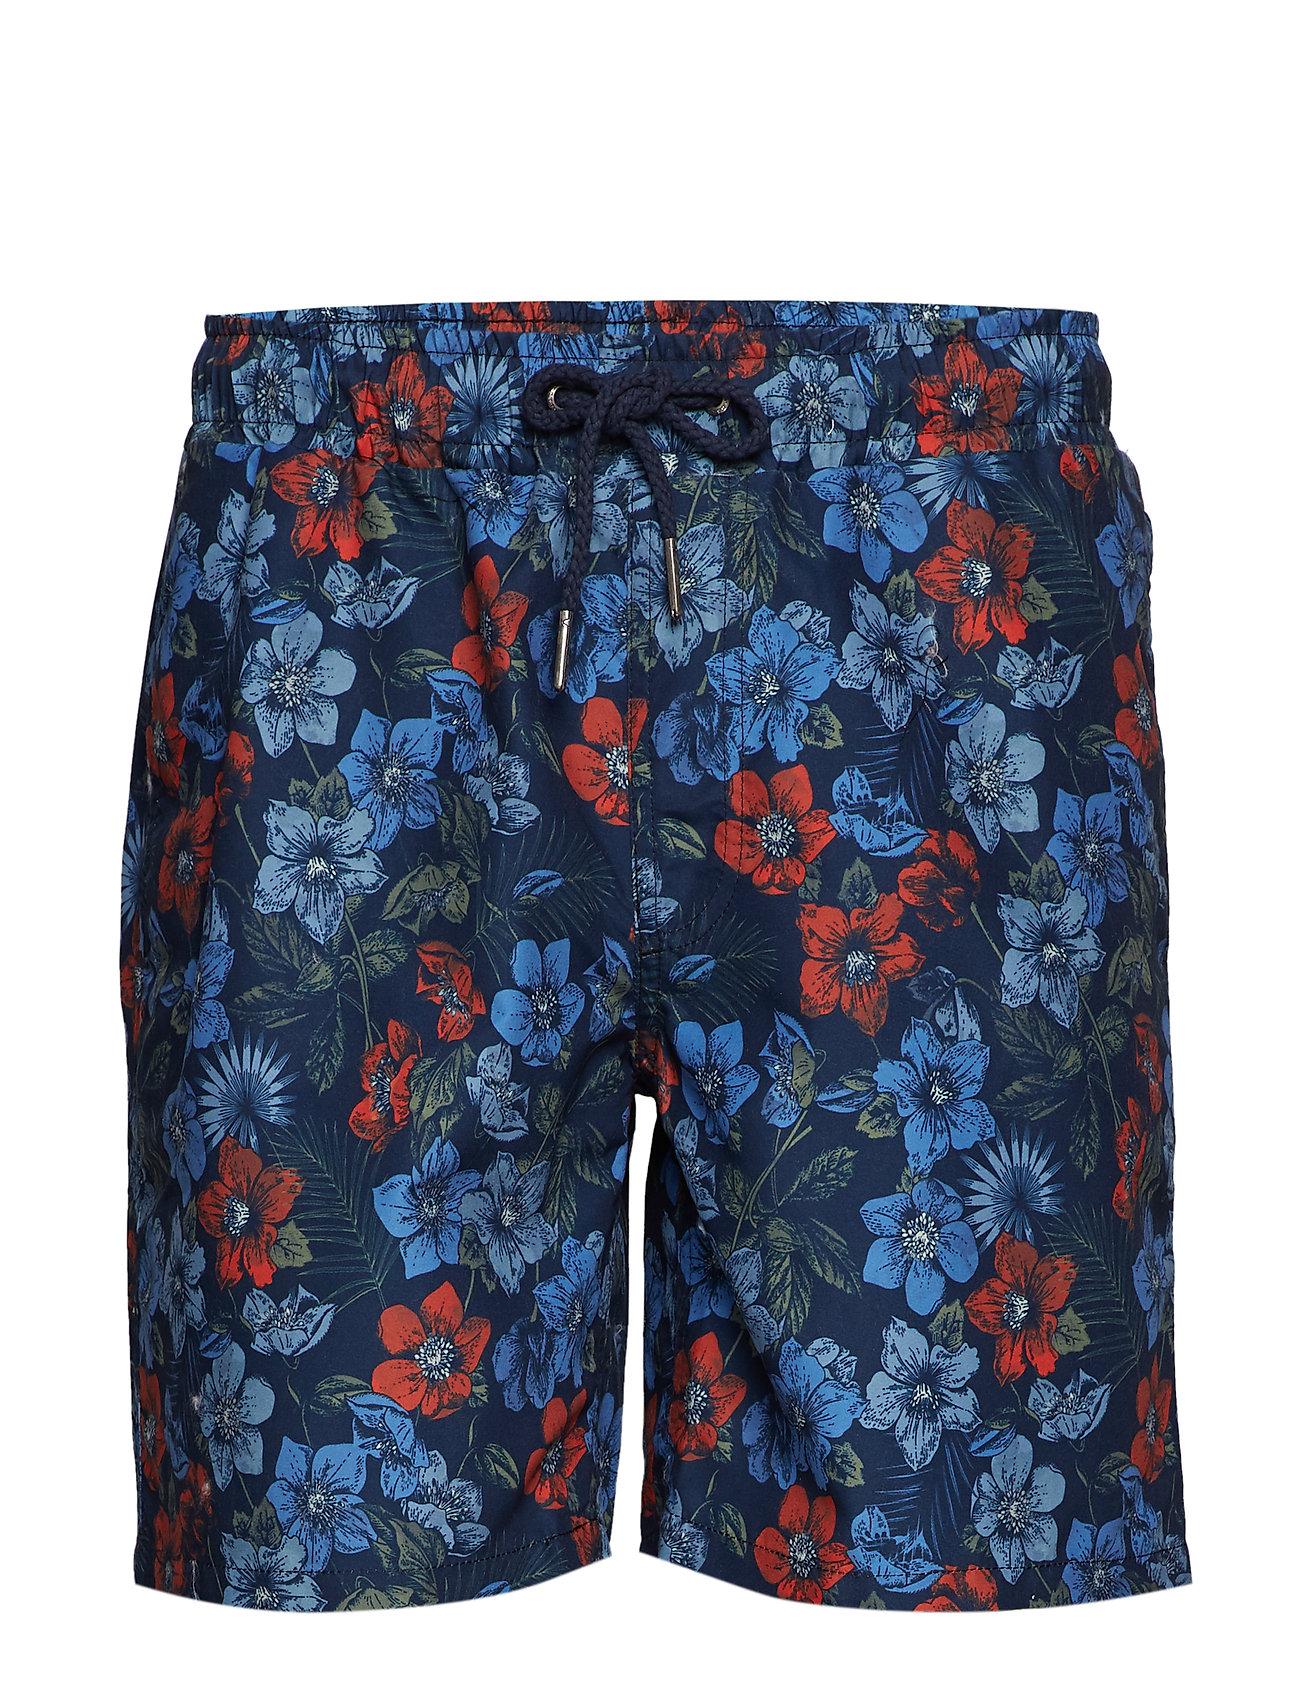 Lindbergh Printed swim shorts - DK BLUE